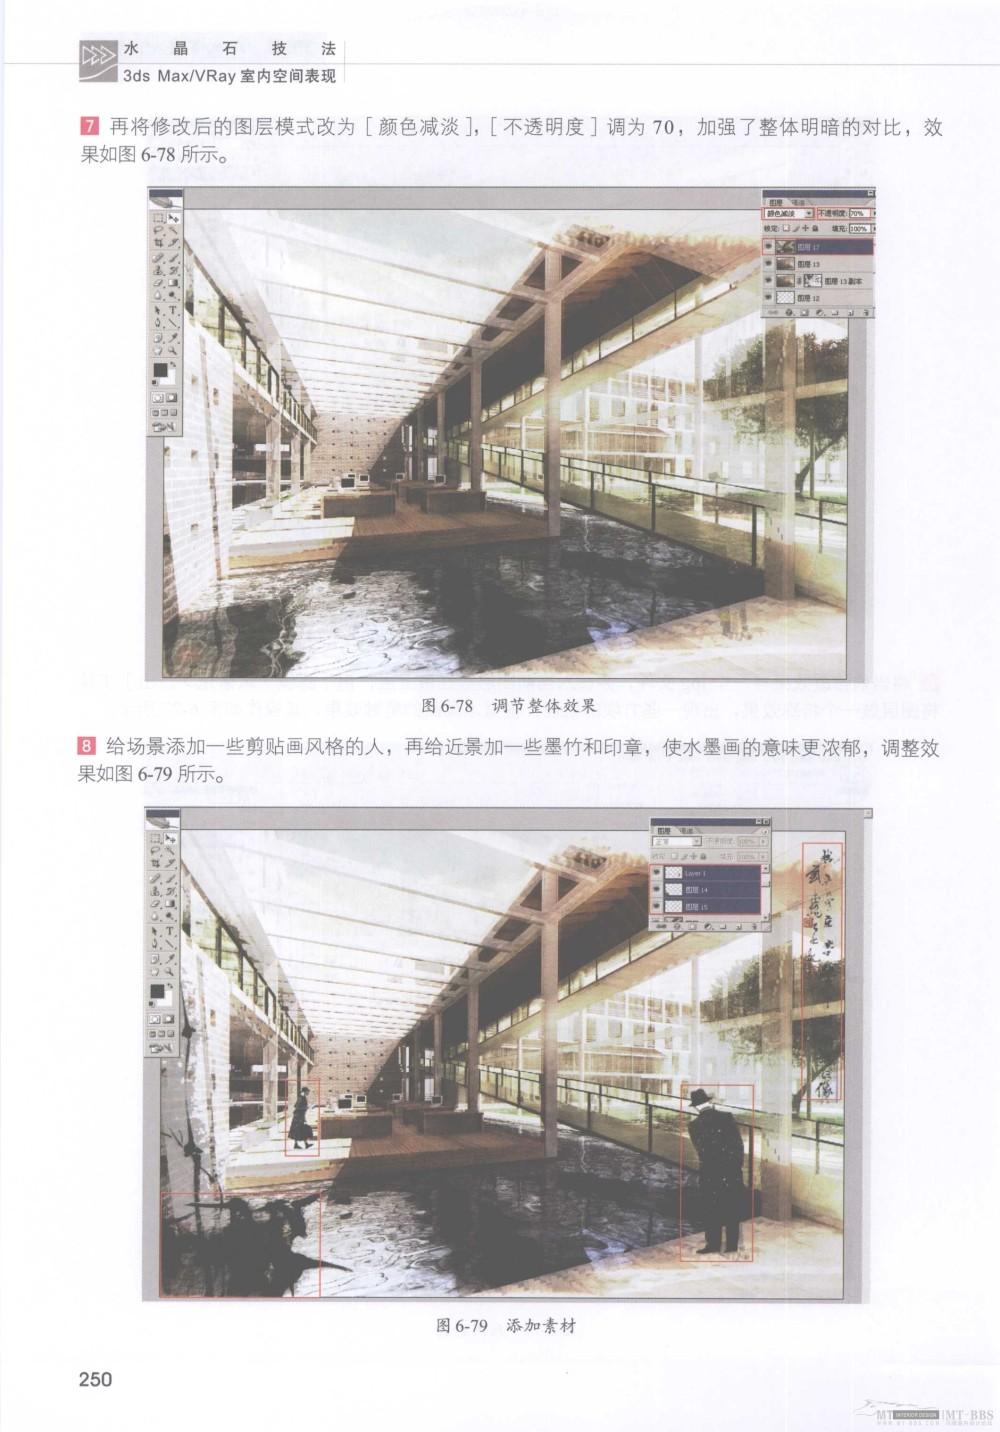 水晶石技法-3ds_Max&VRay室内空间表现_水晶石技法-3ds_Max&VRay室内空间表现_页面_256.jpg